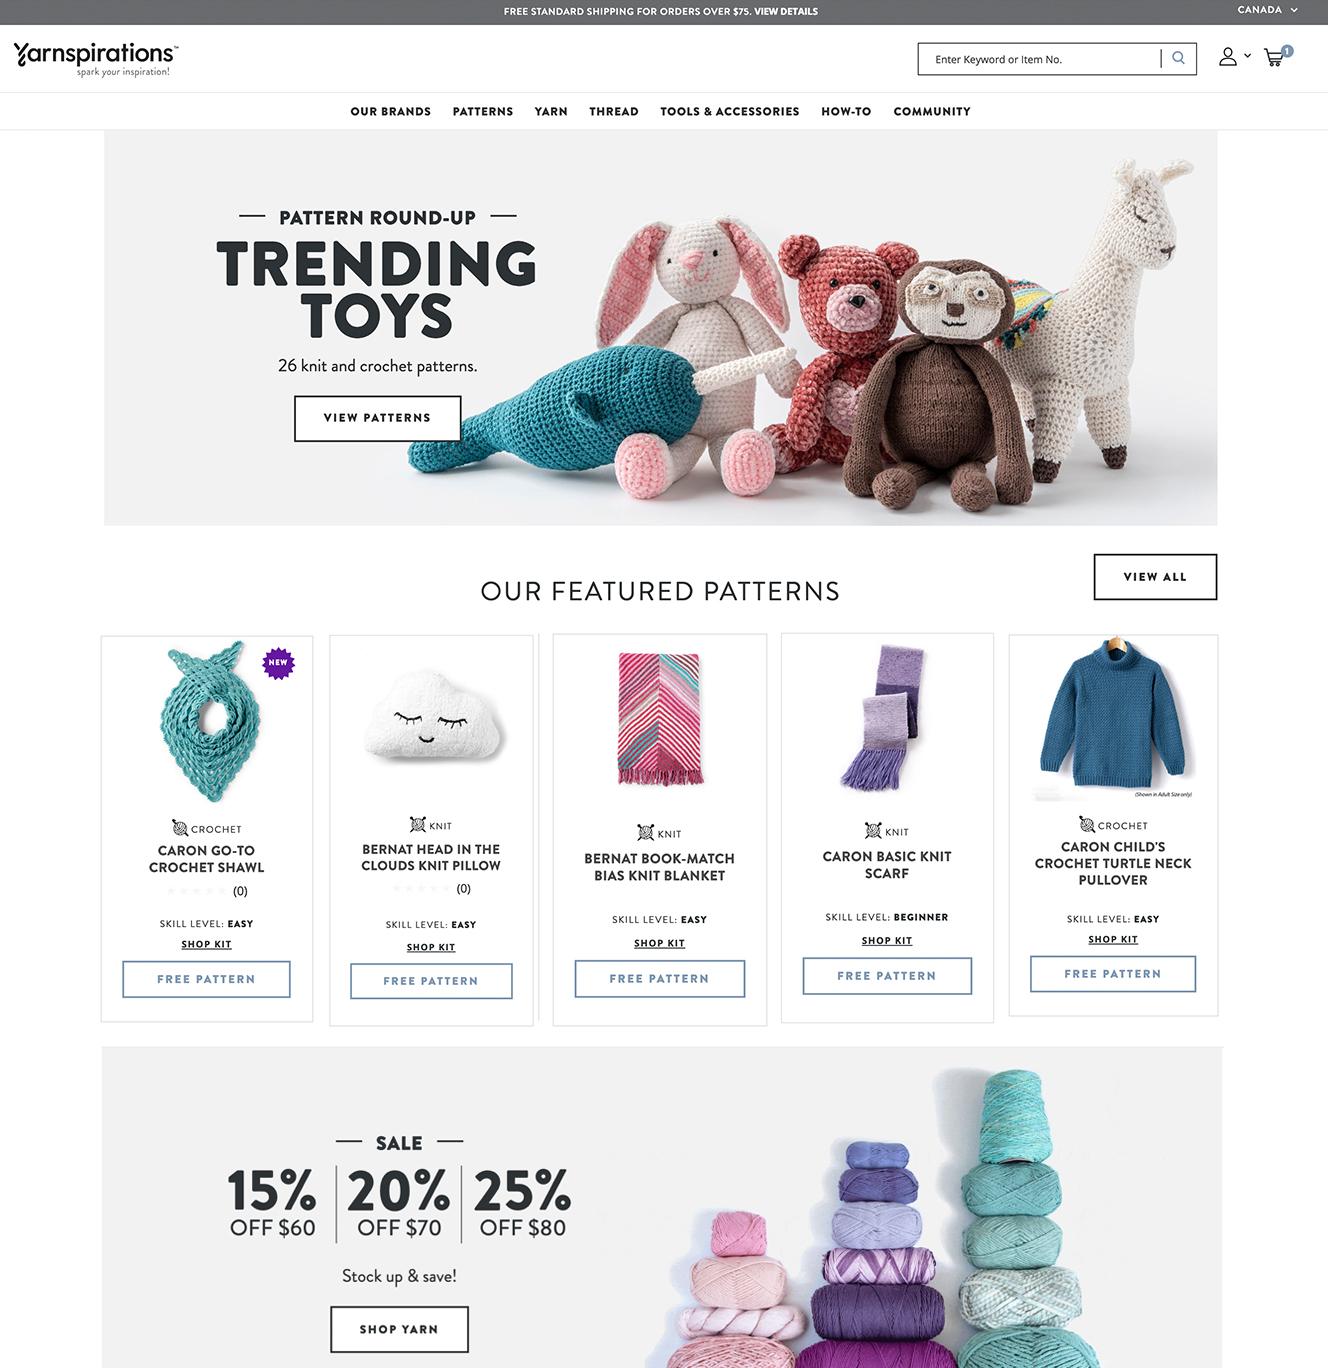 Yarnspirations.com Rebrand & Site Relaunch image